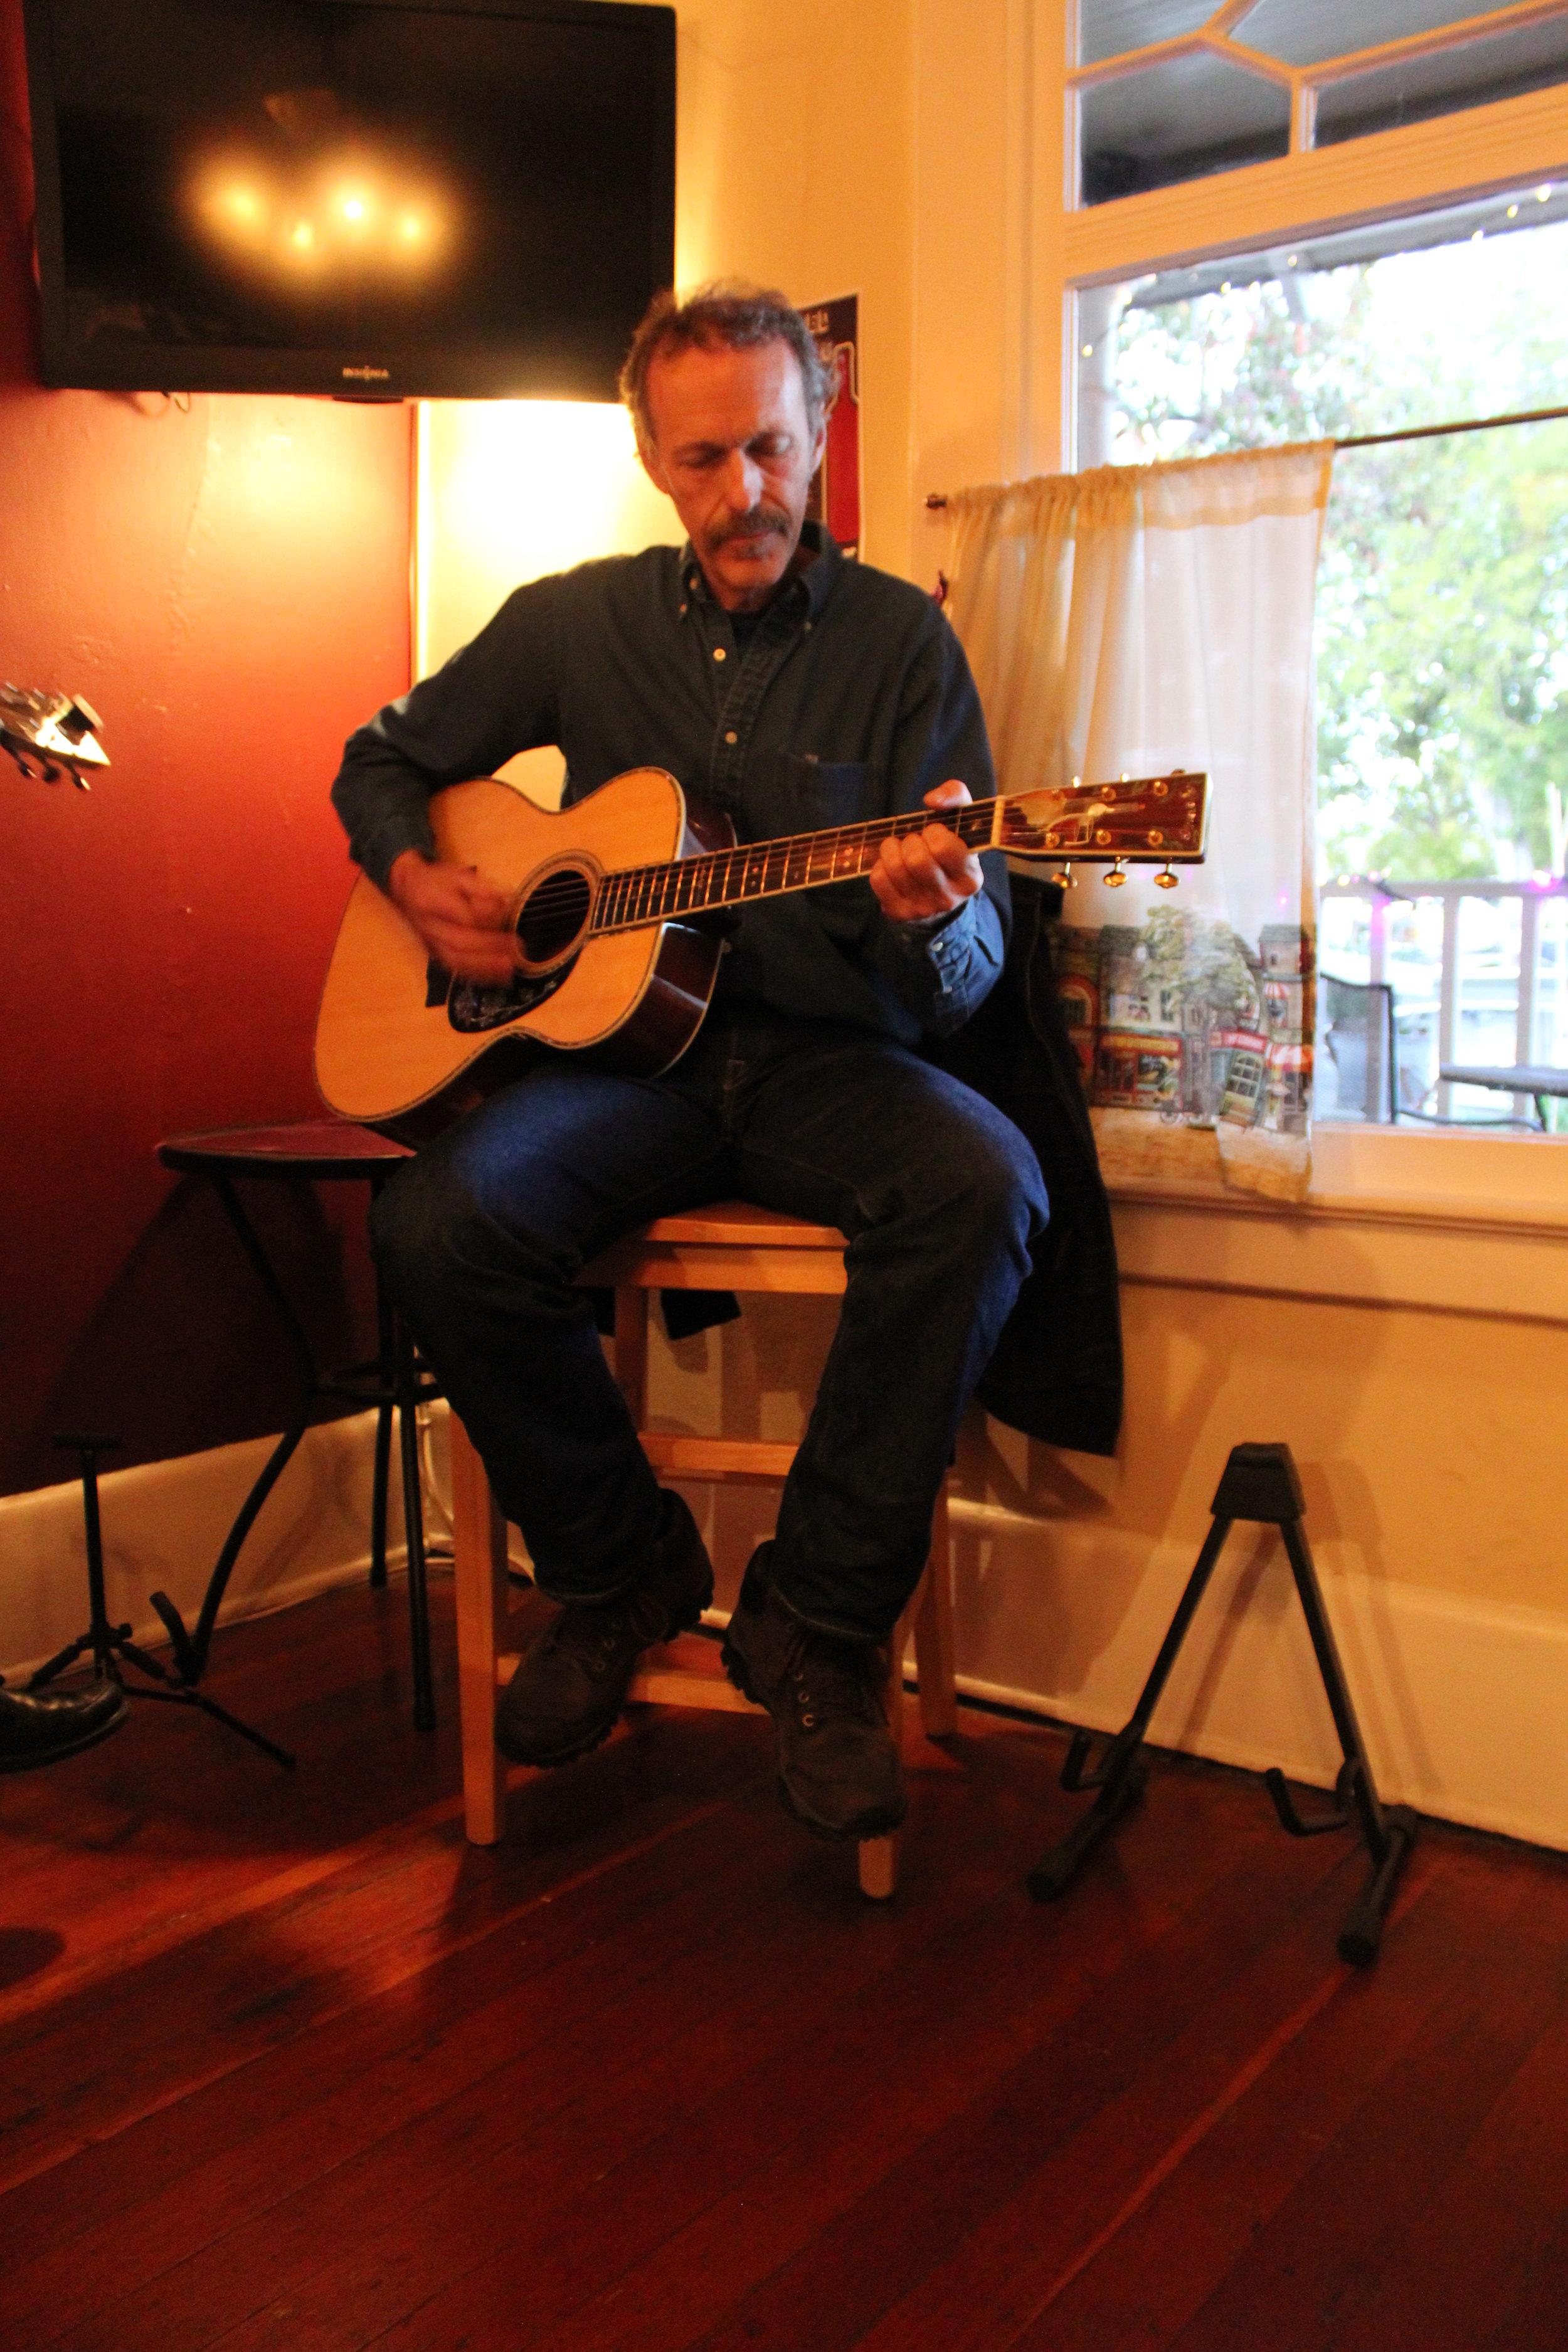 Fred Scherrer, owner, winemaker, and resident guitarist of Scherrer Winery, Sonoma, CA.